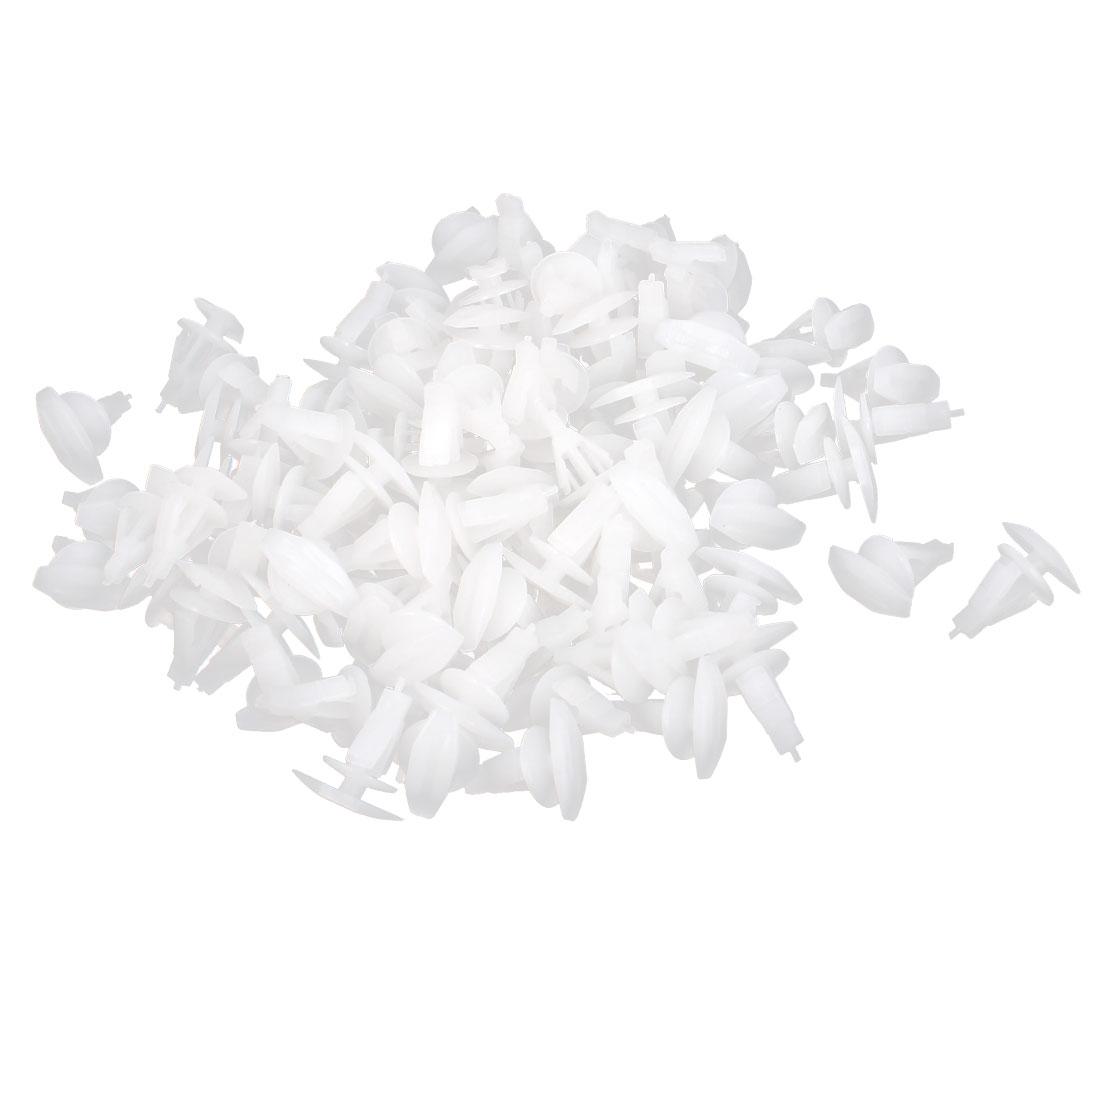 100 Pcs White Plastic Rivet Trim Fastener Moulding Clips 7mm x 9mm x 12mm